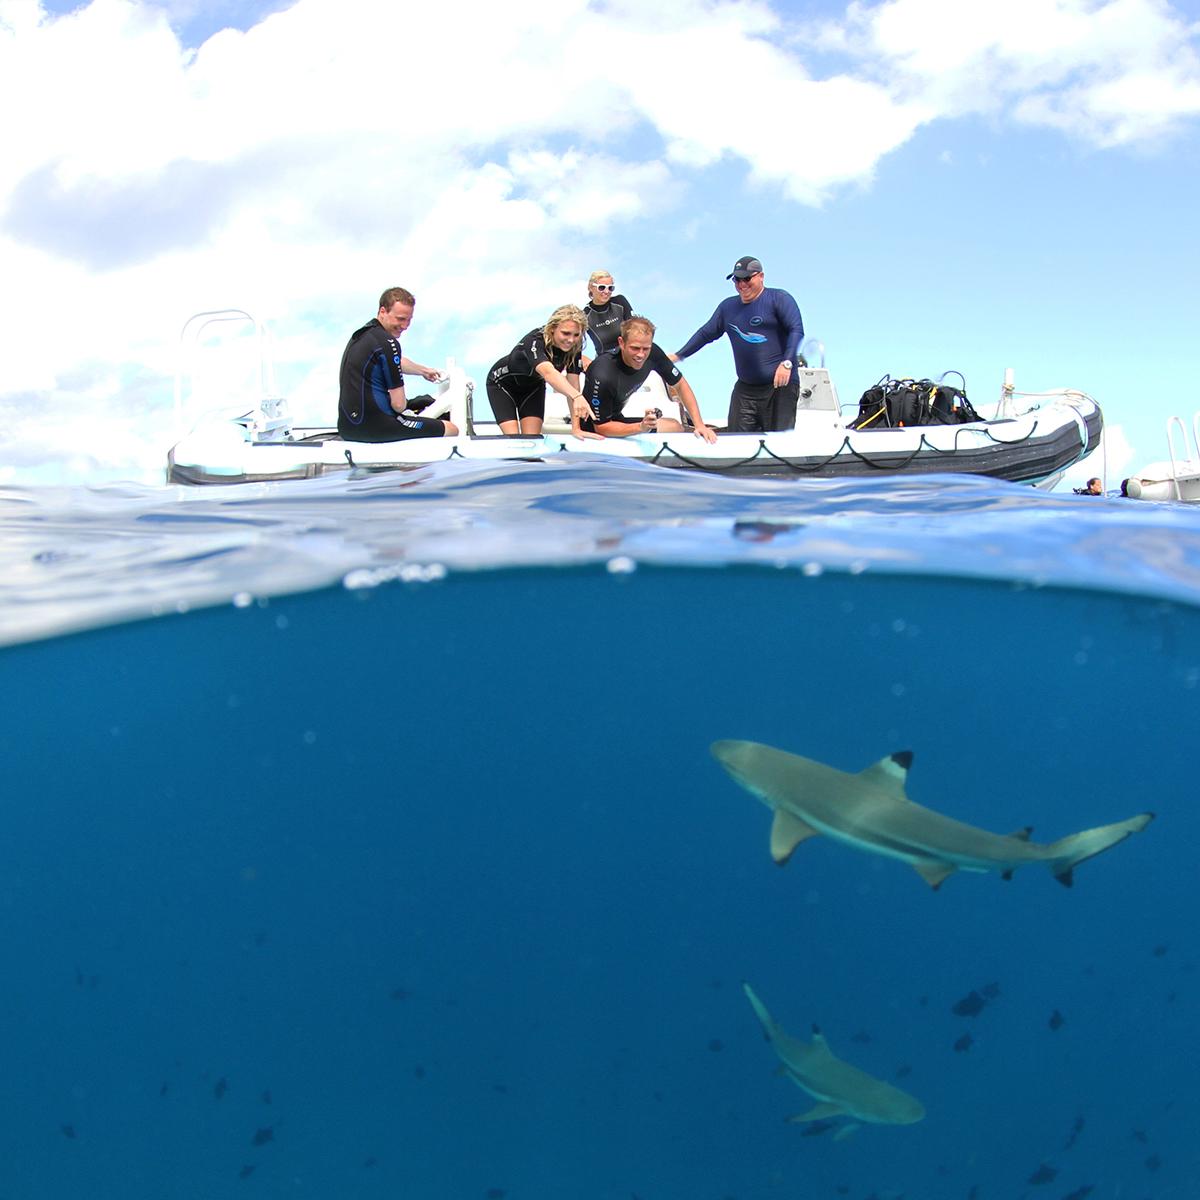 spl underwater photography